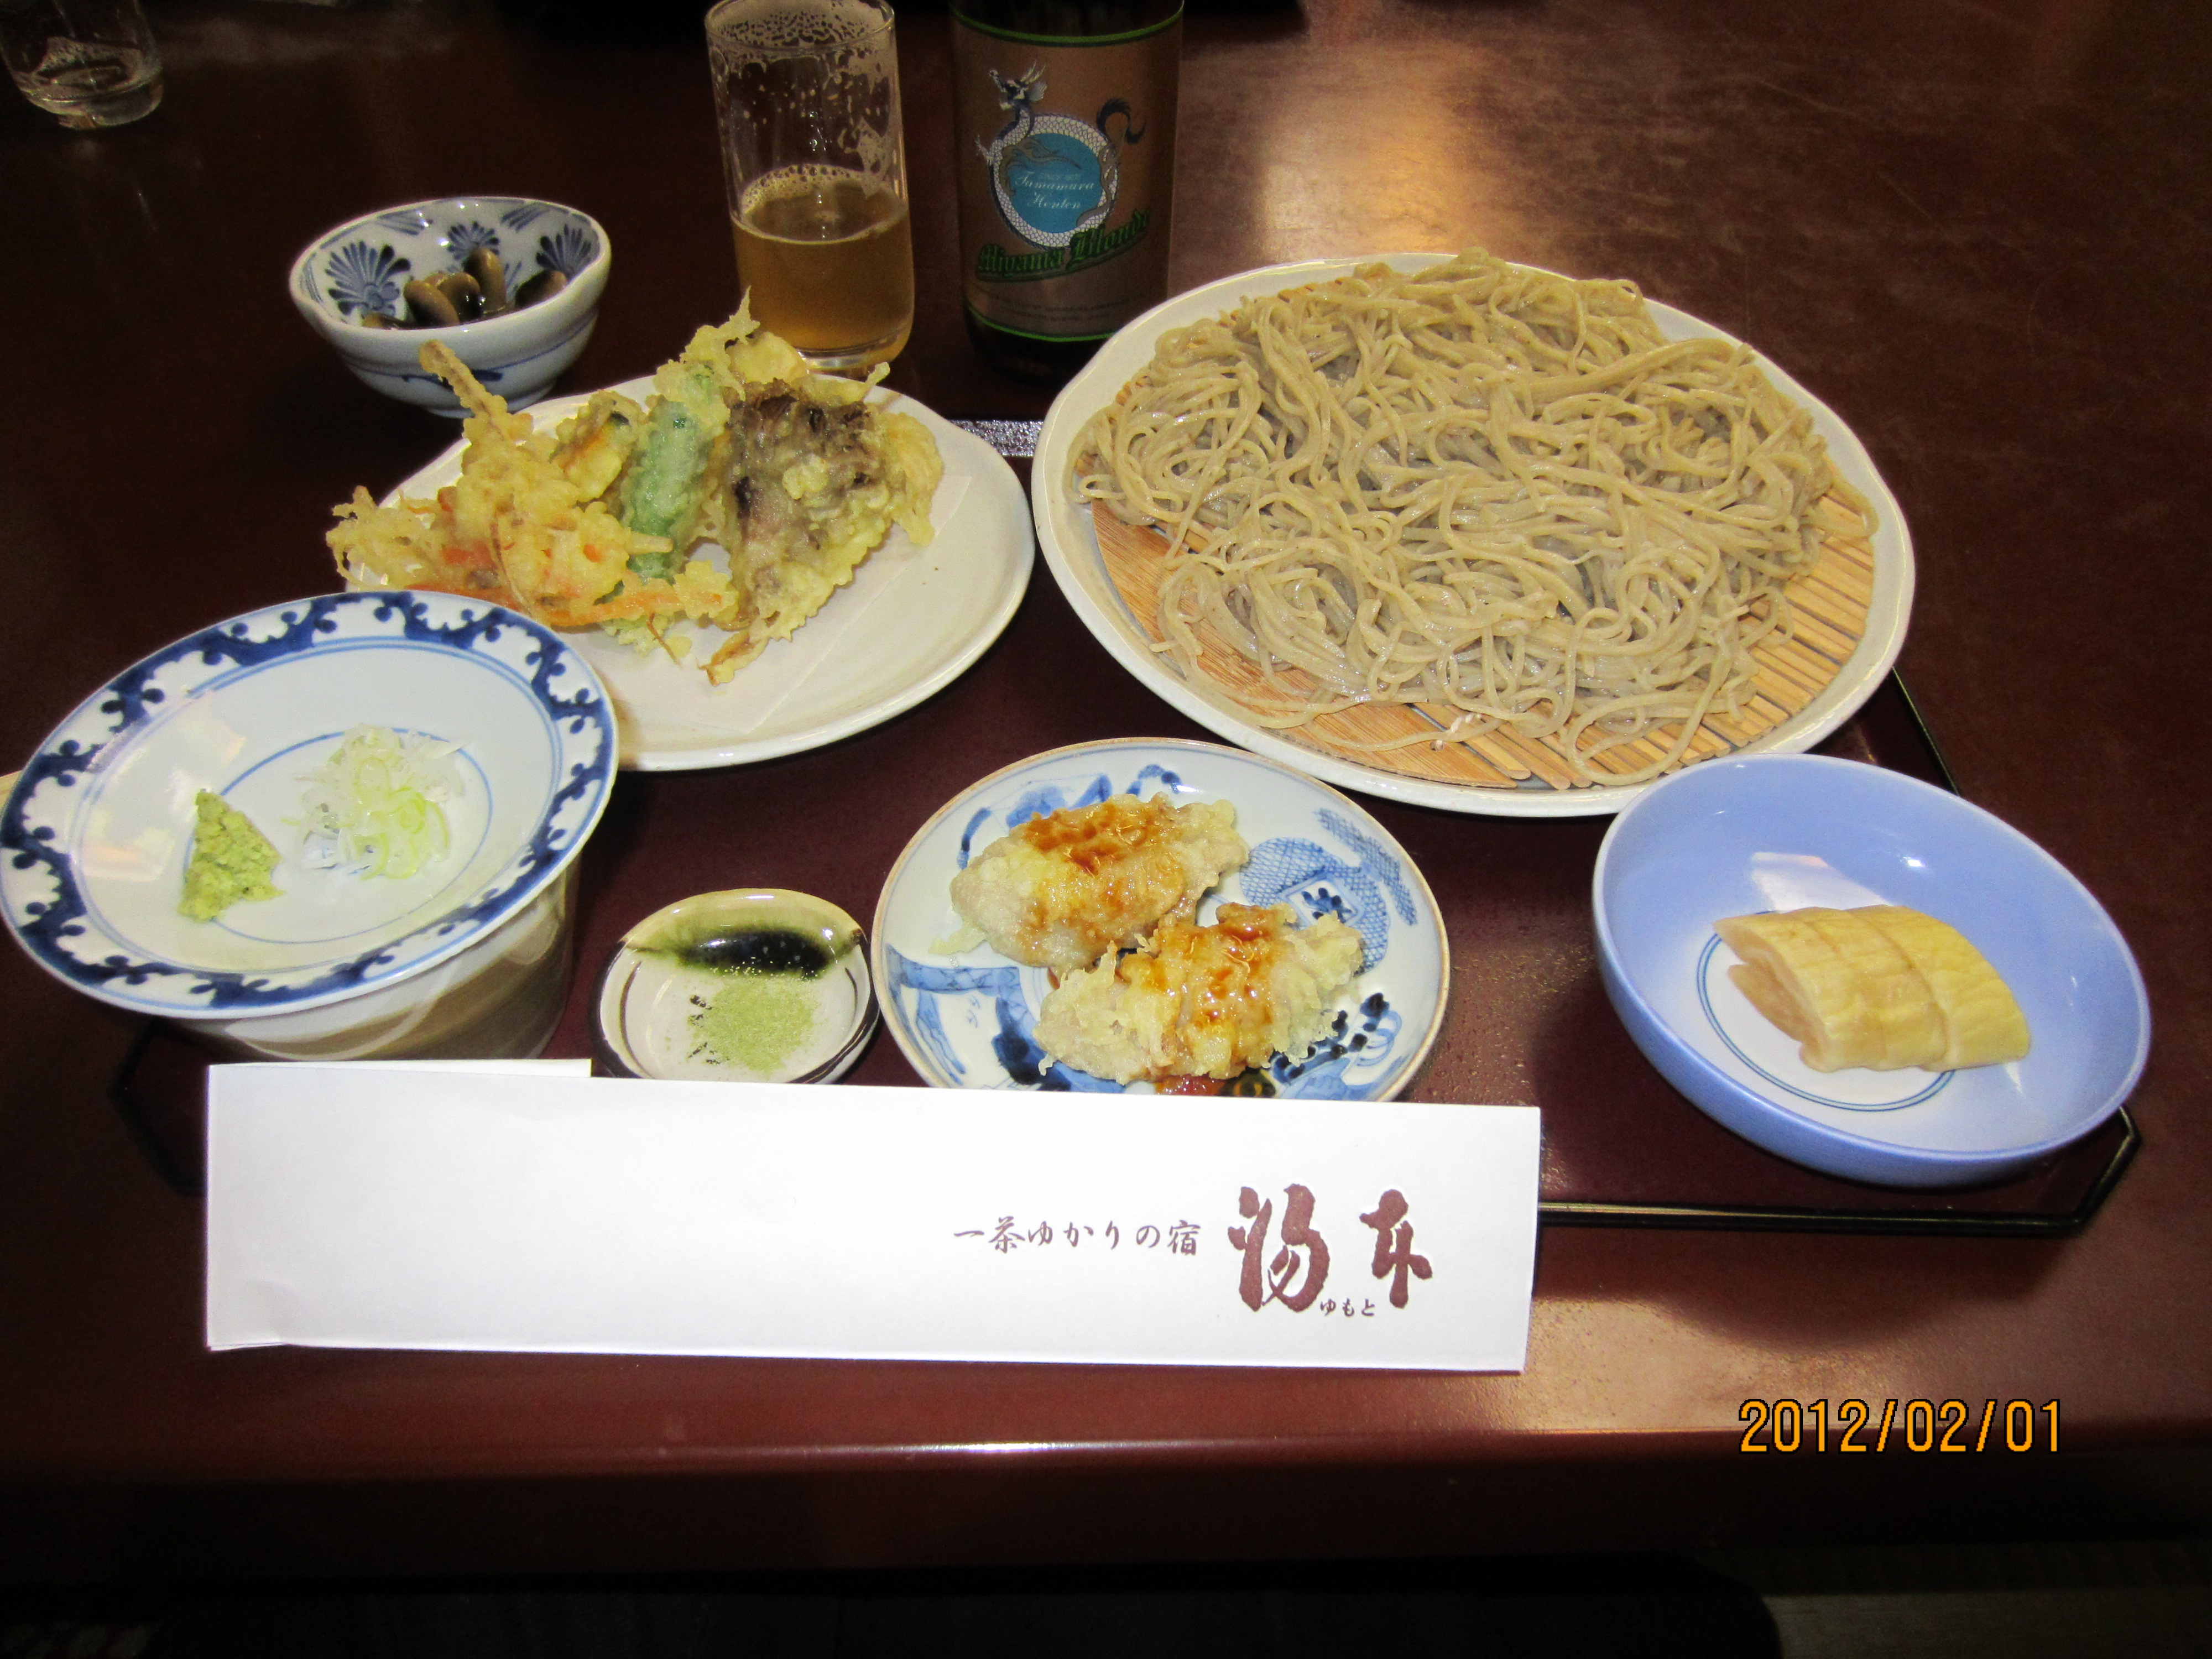 http://www.washin-optical.co.jp/blog/ladies/IMG_0261.JPG